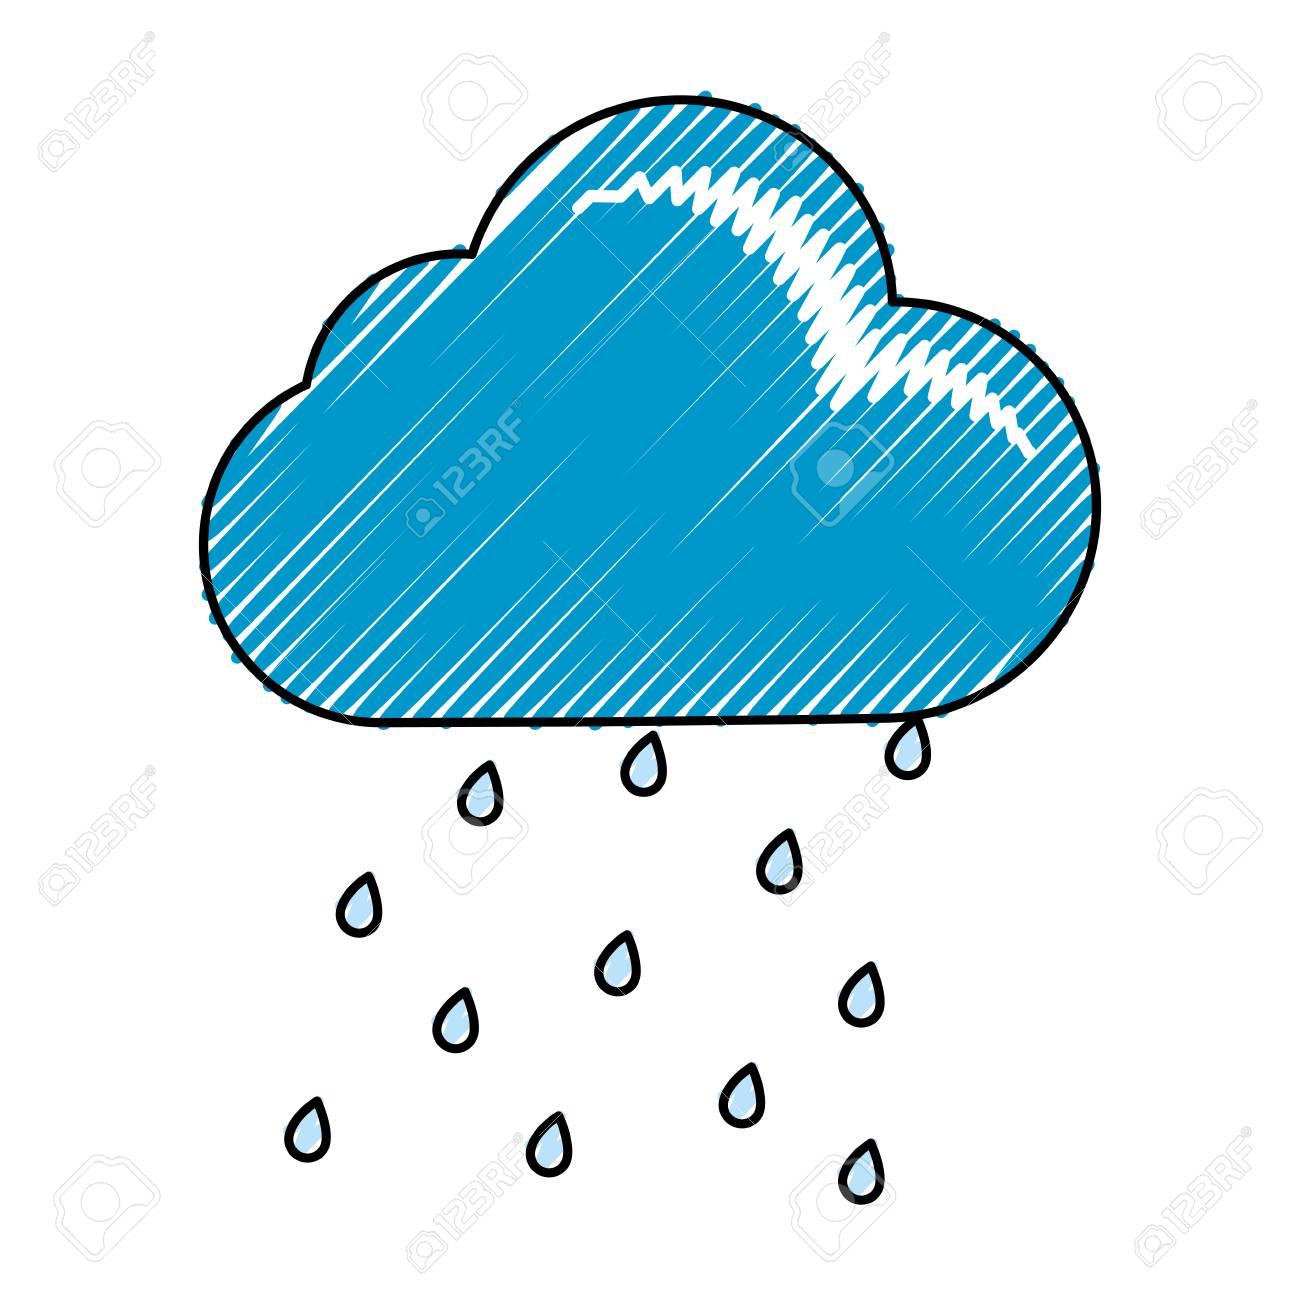 Image result for rainy cartoon